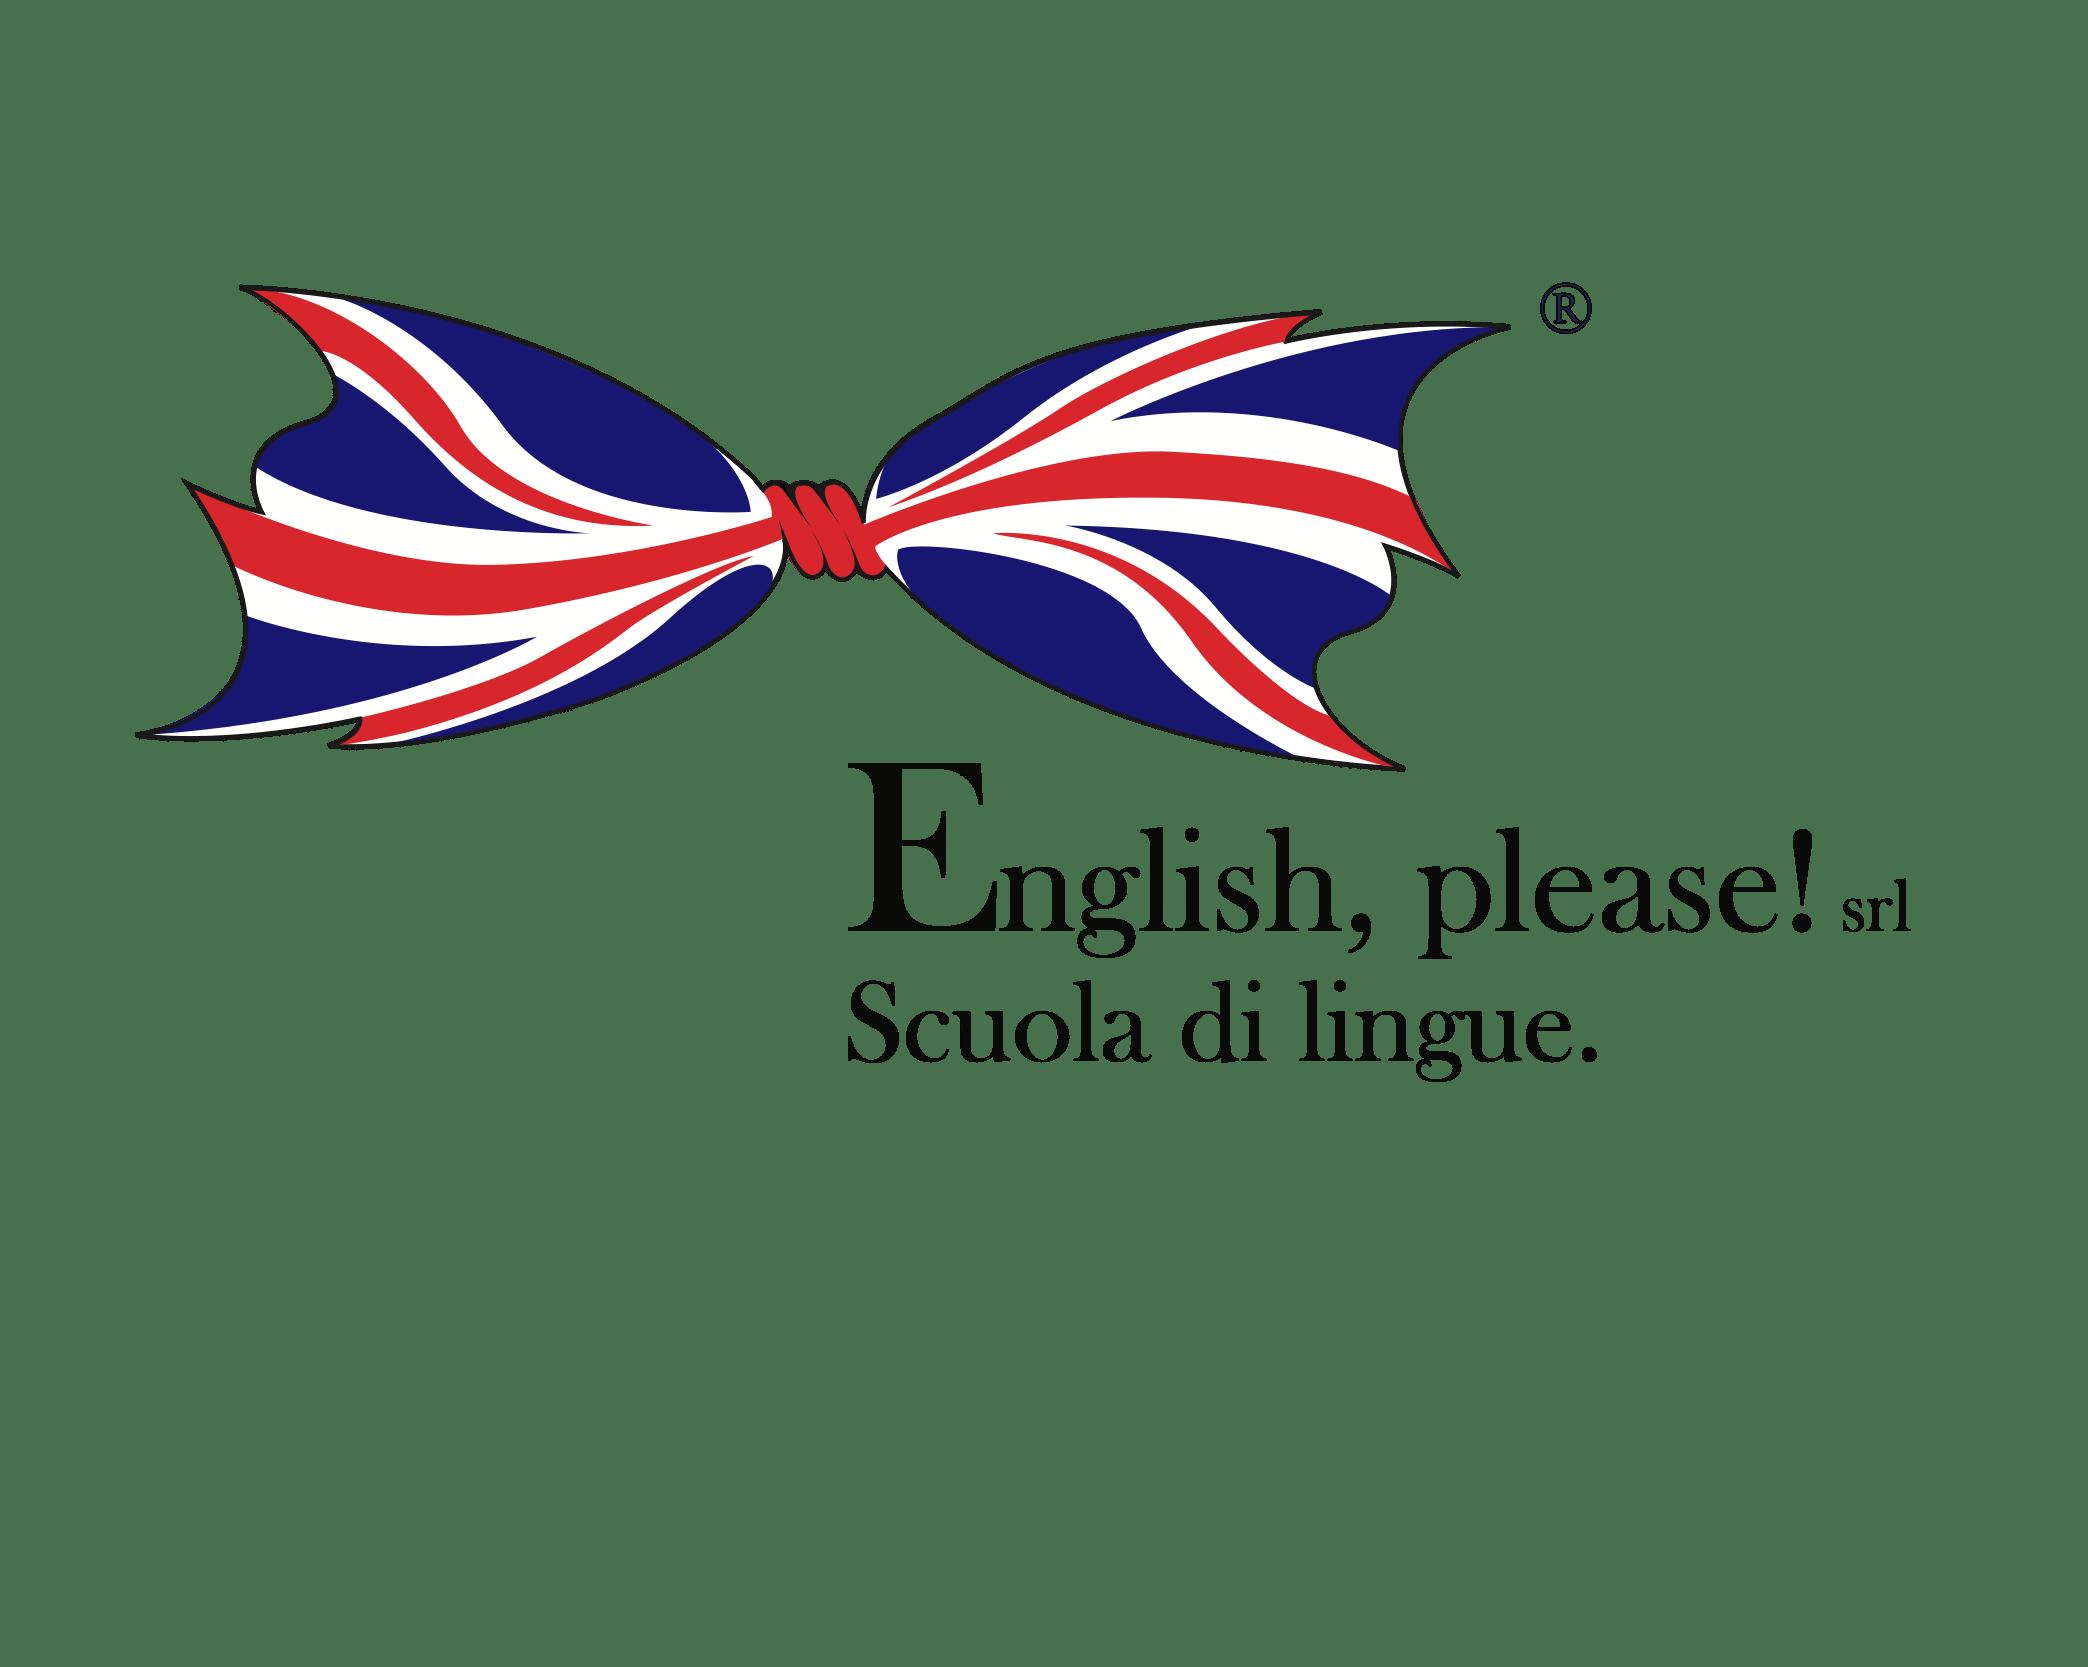 English, please! srl